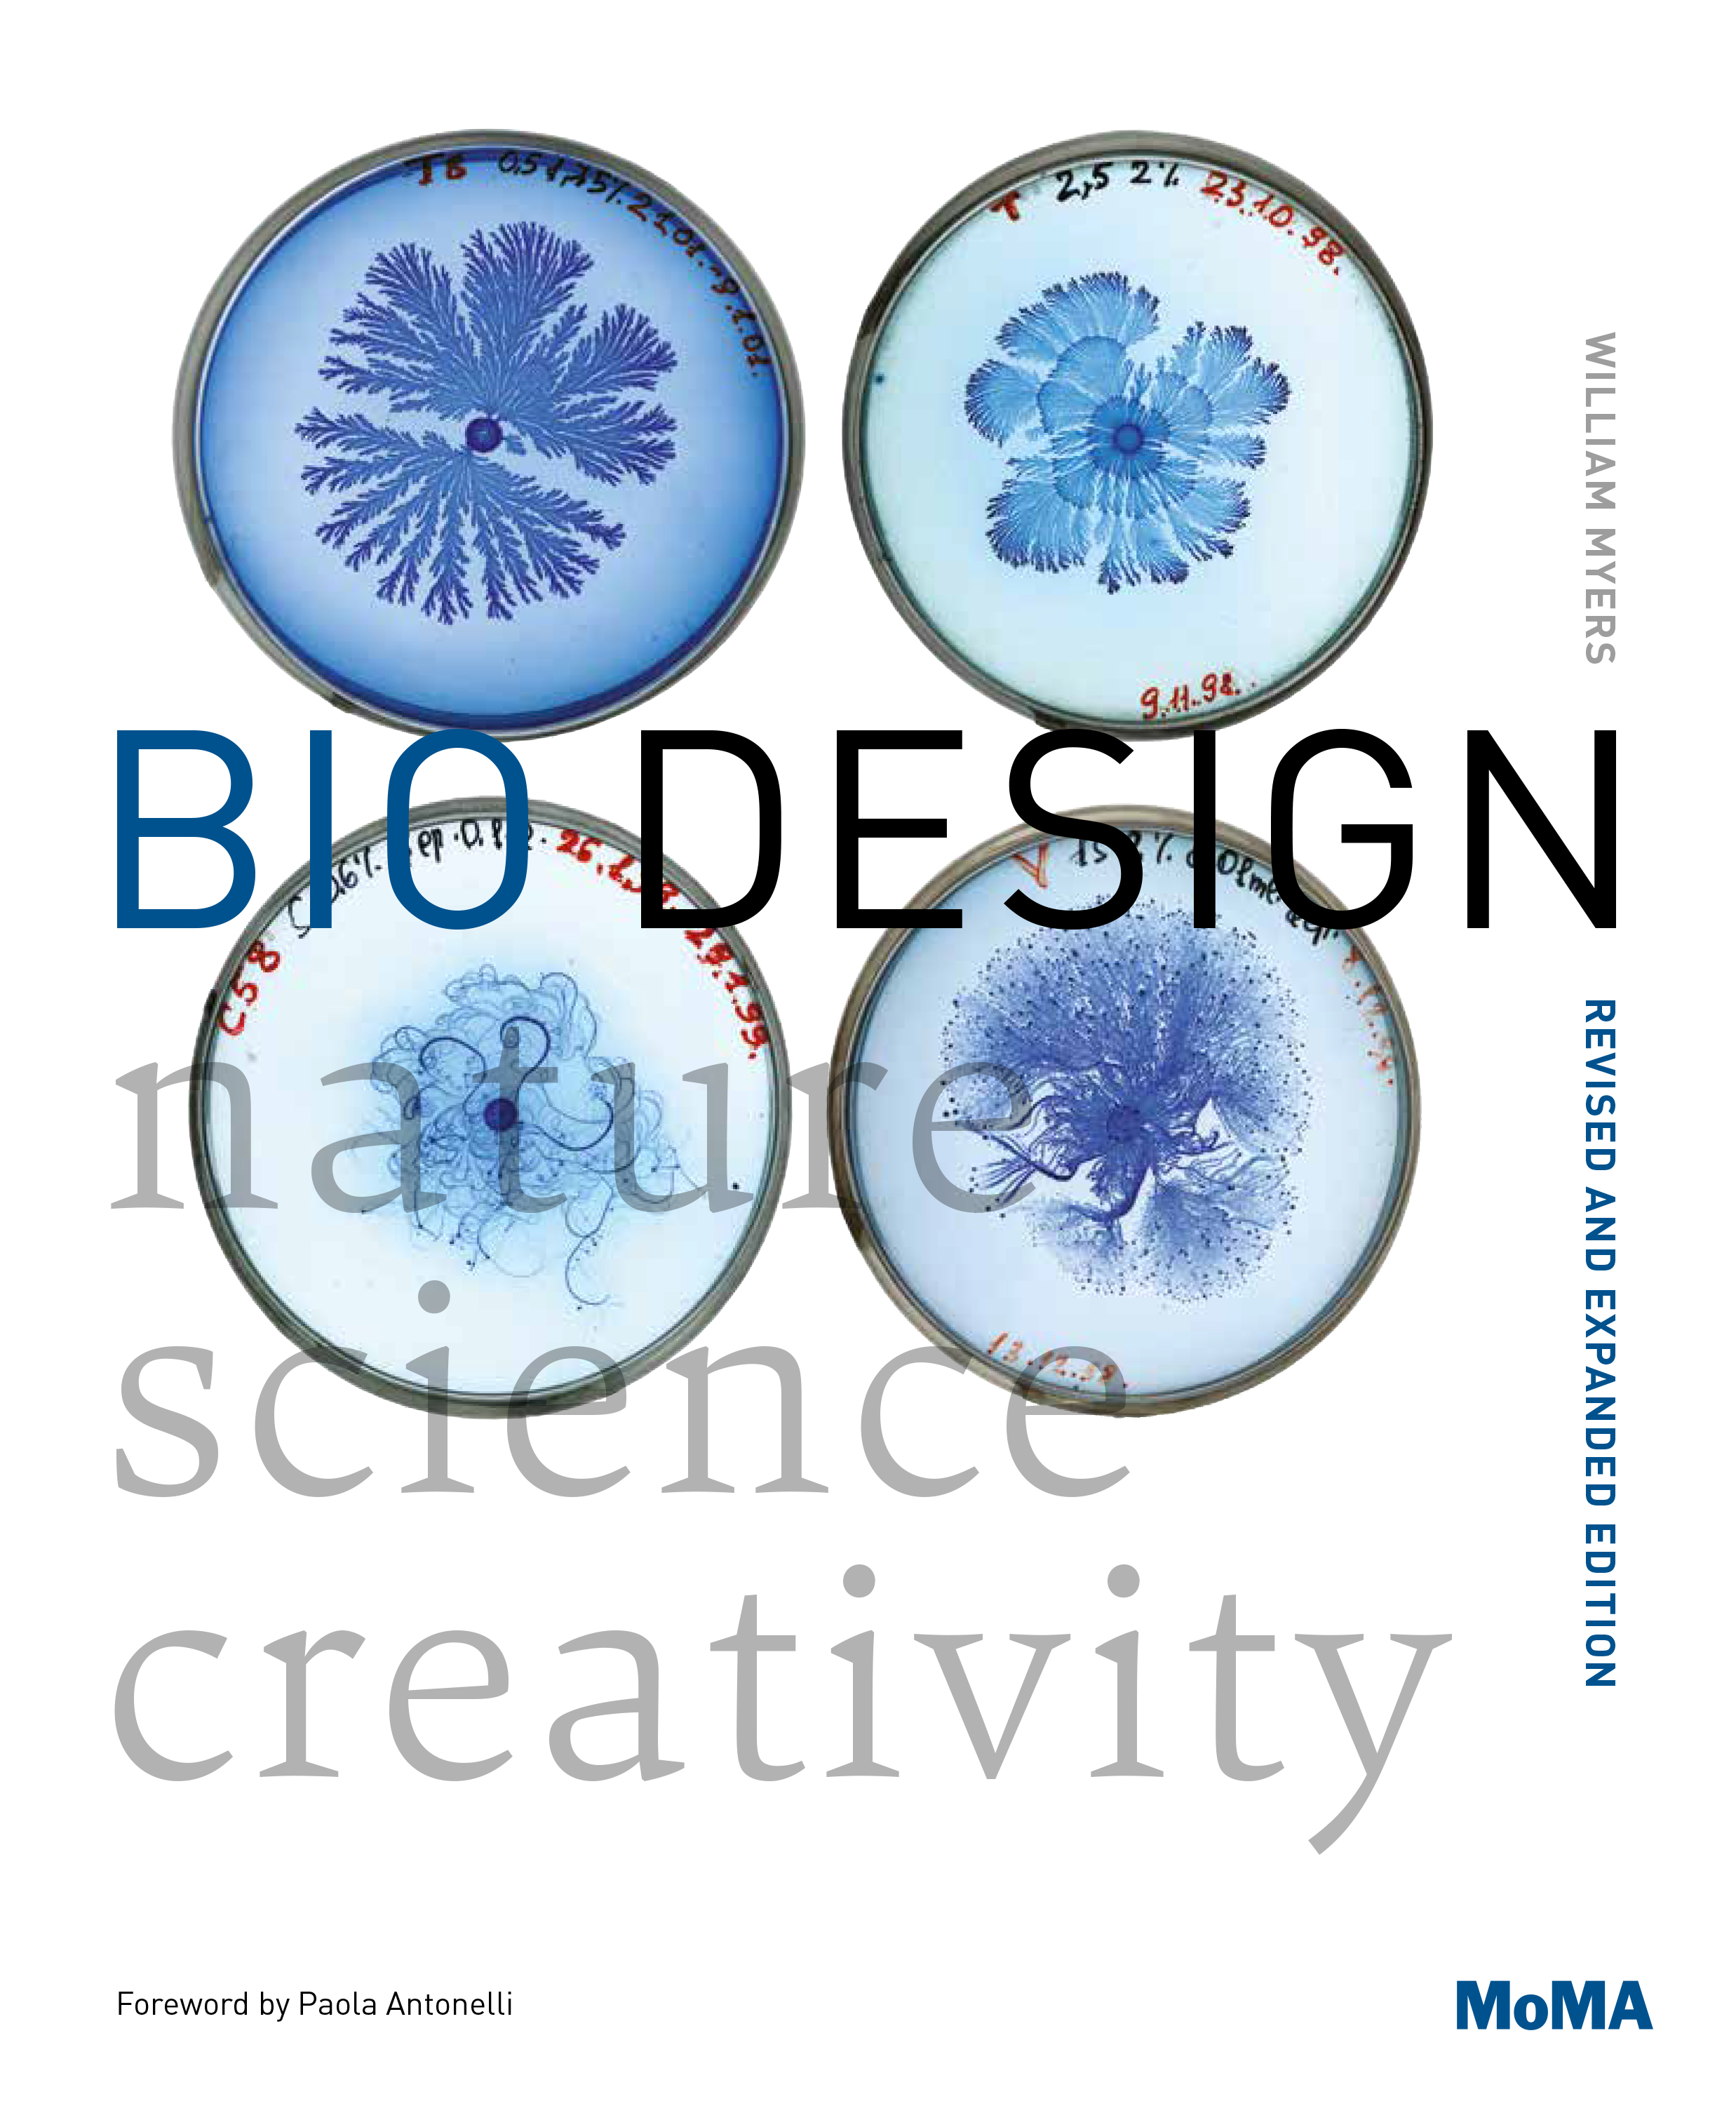 Biodesign, MoMA, 2018